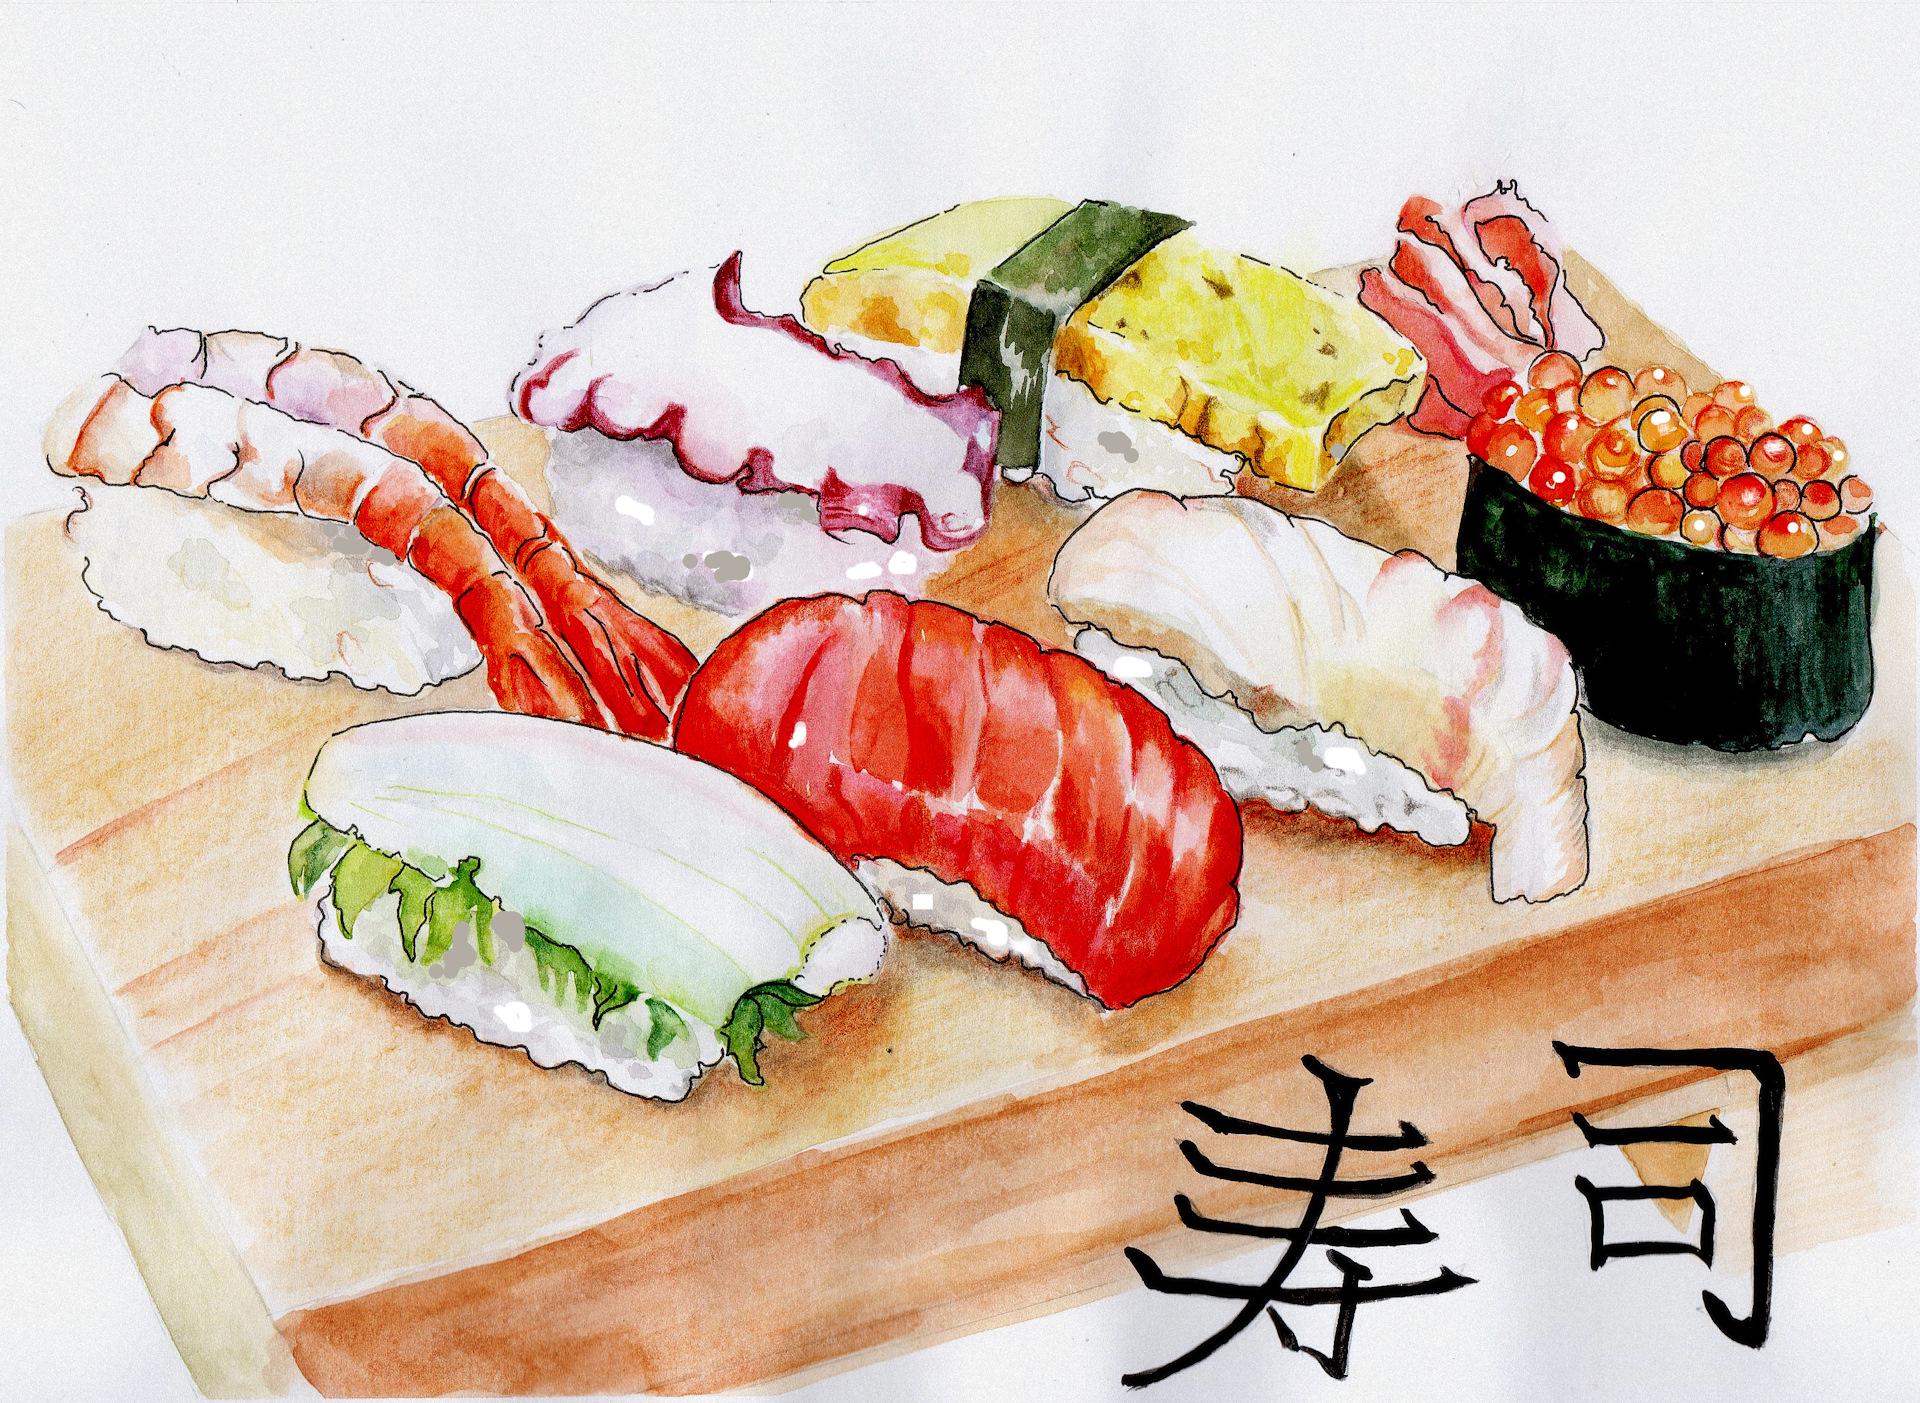 суши рисунки красками старший